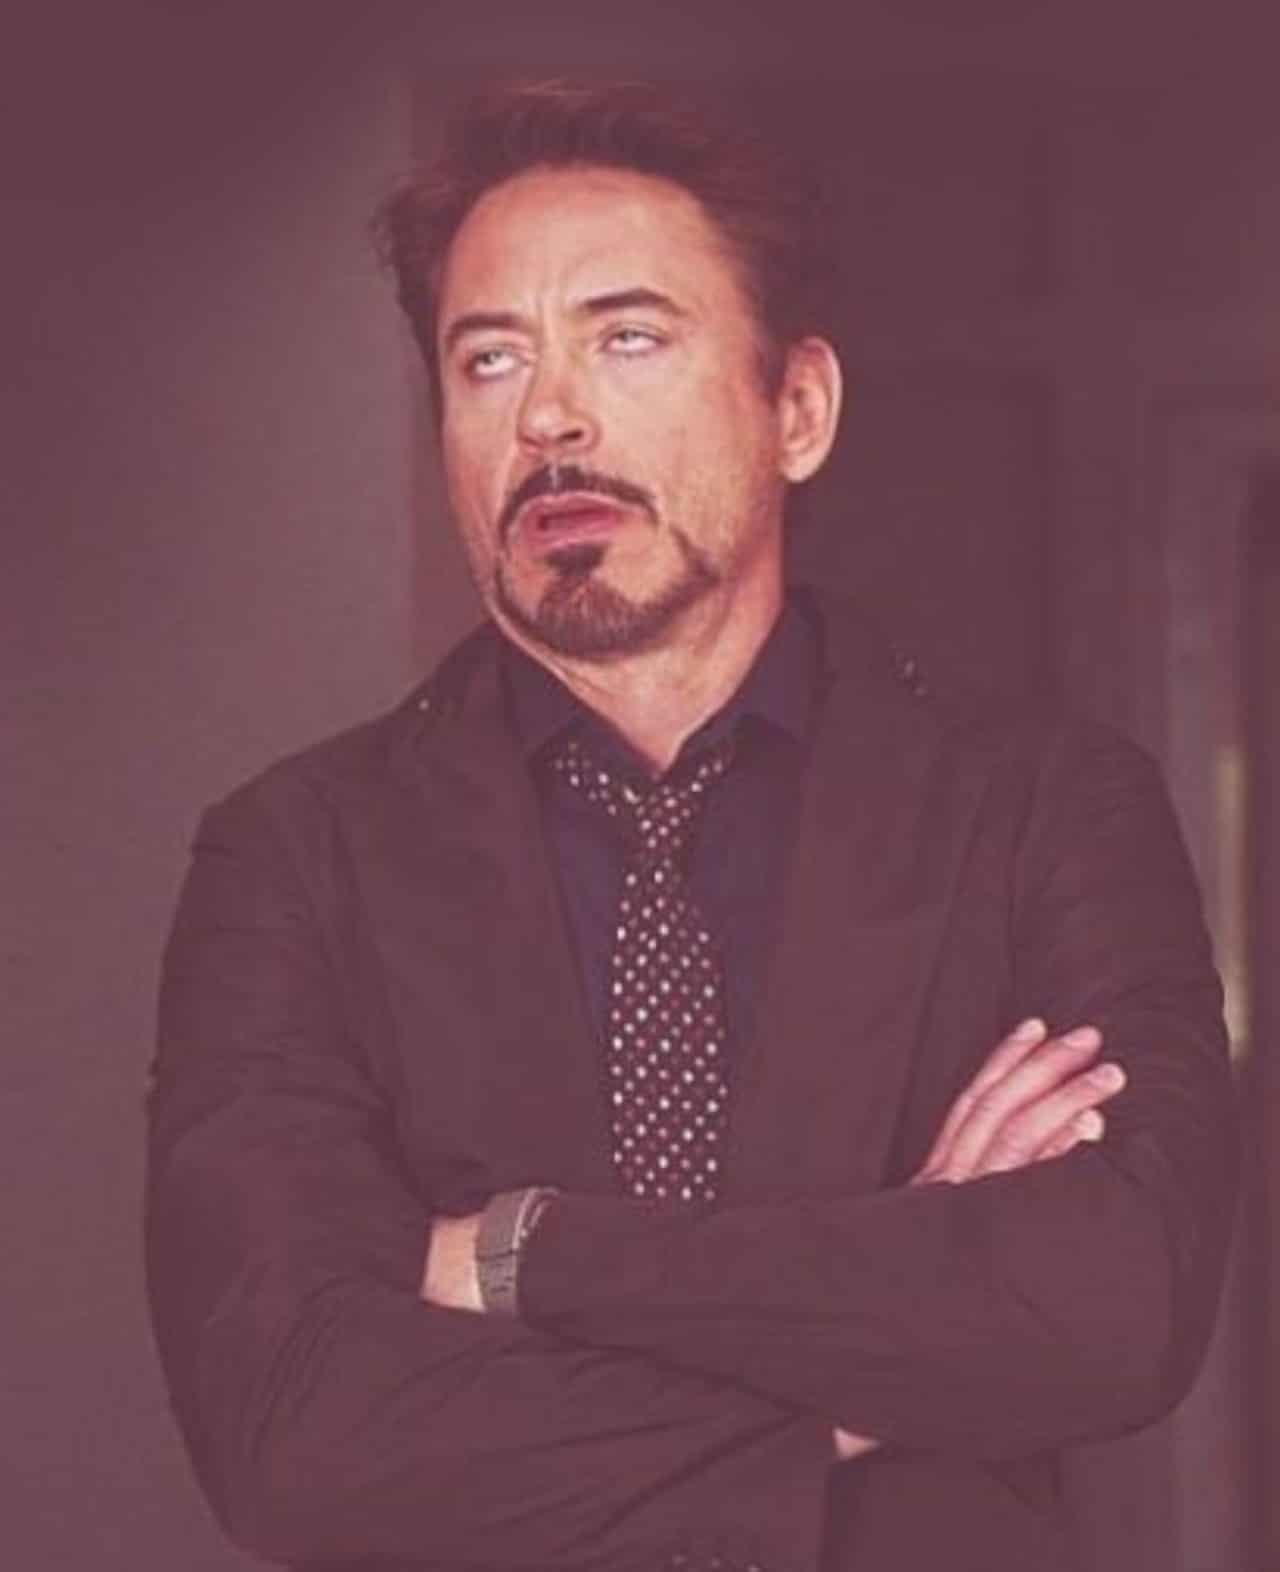 Meme Robert Downey ojos de huevo